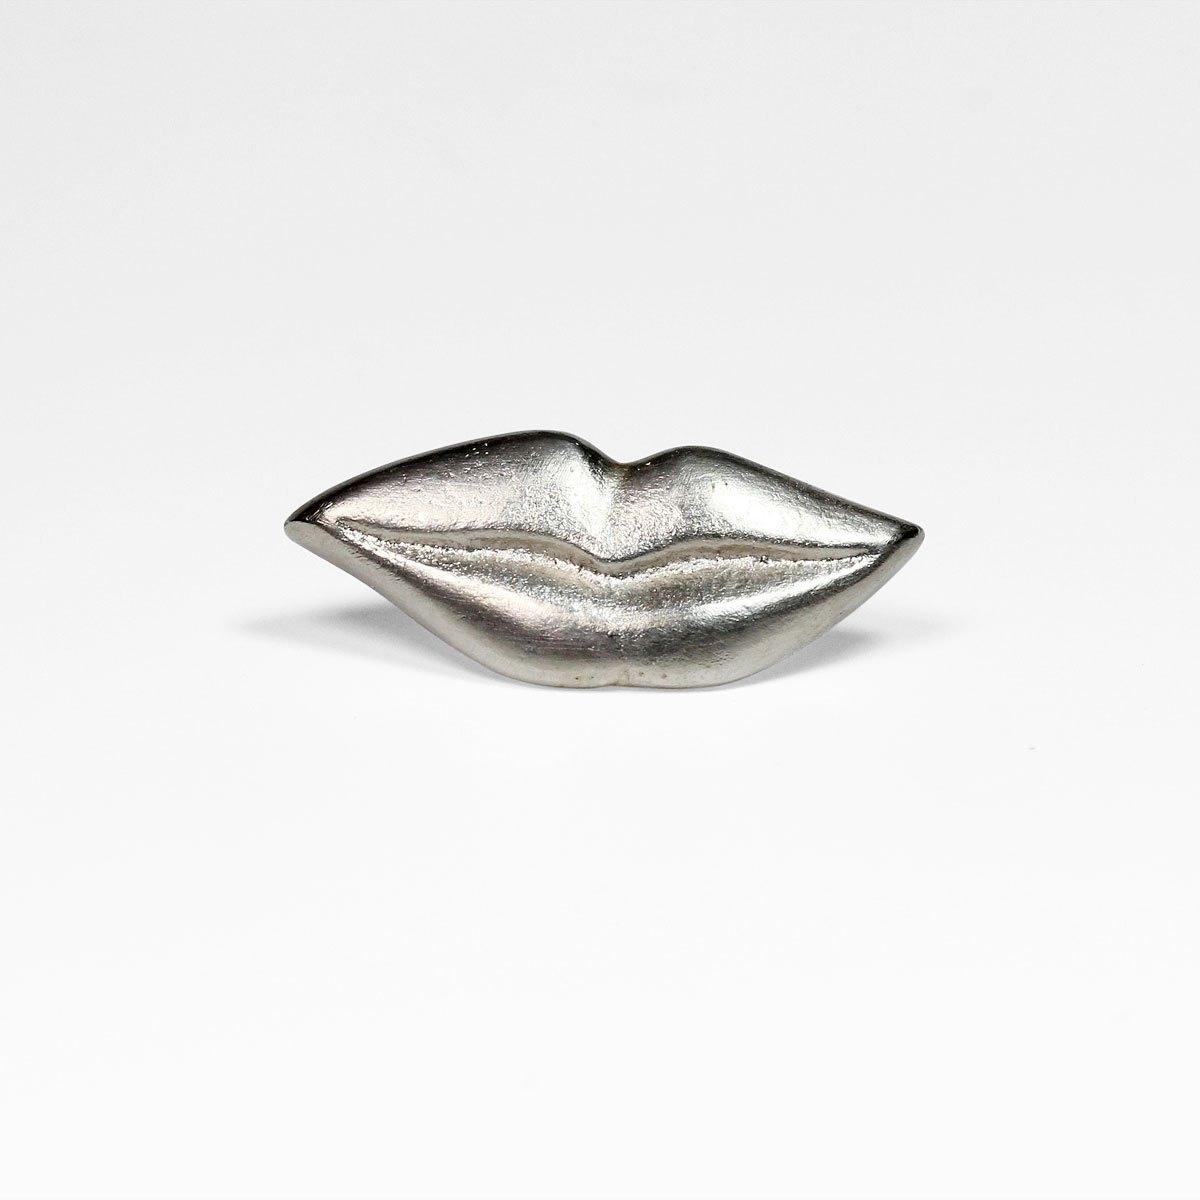 »Mona Lisa« / Pin / Sandguss Silber / Mund